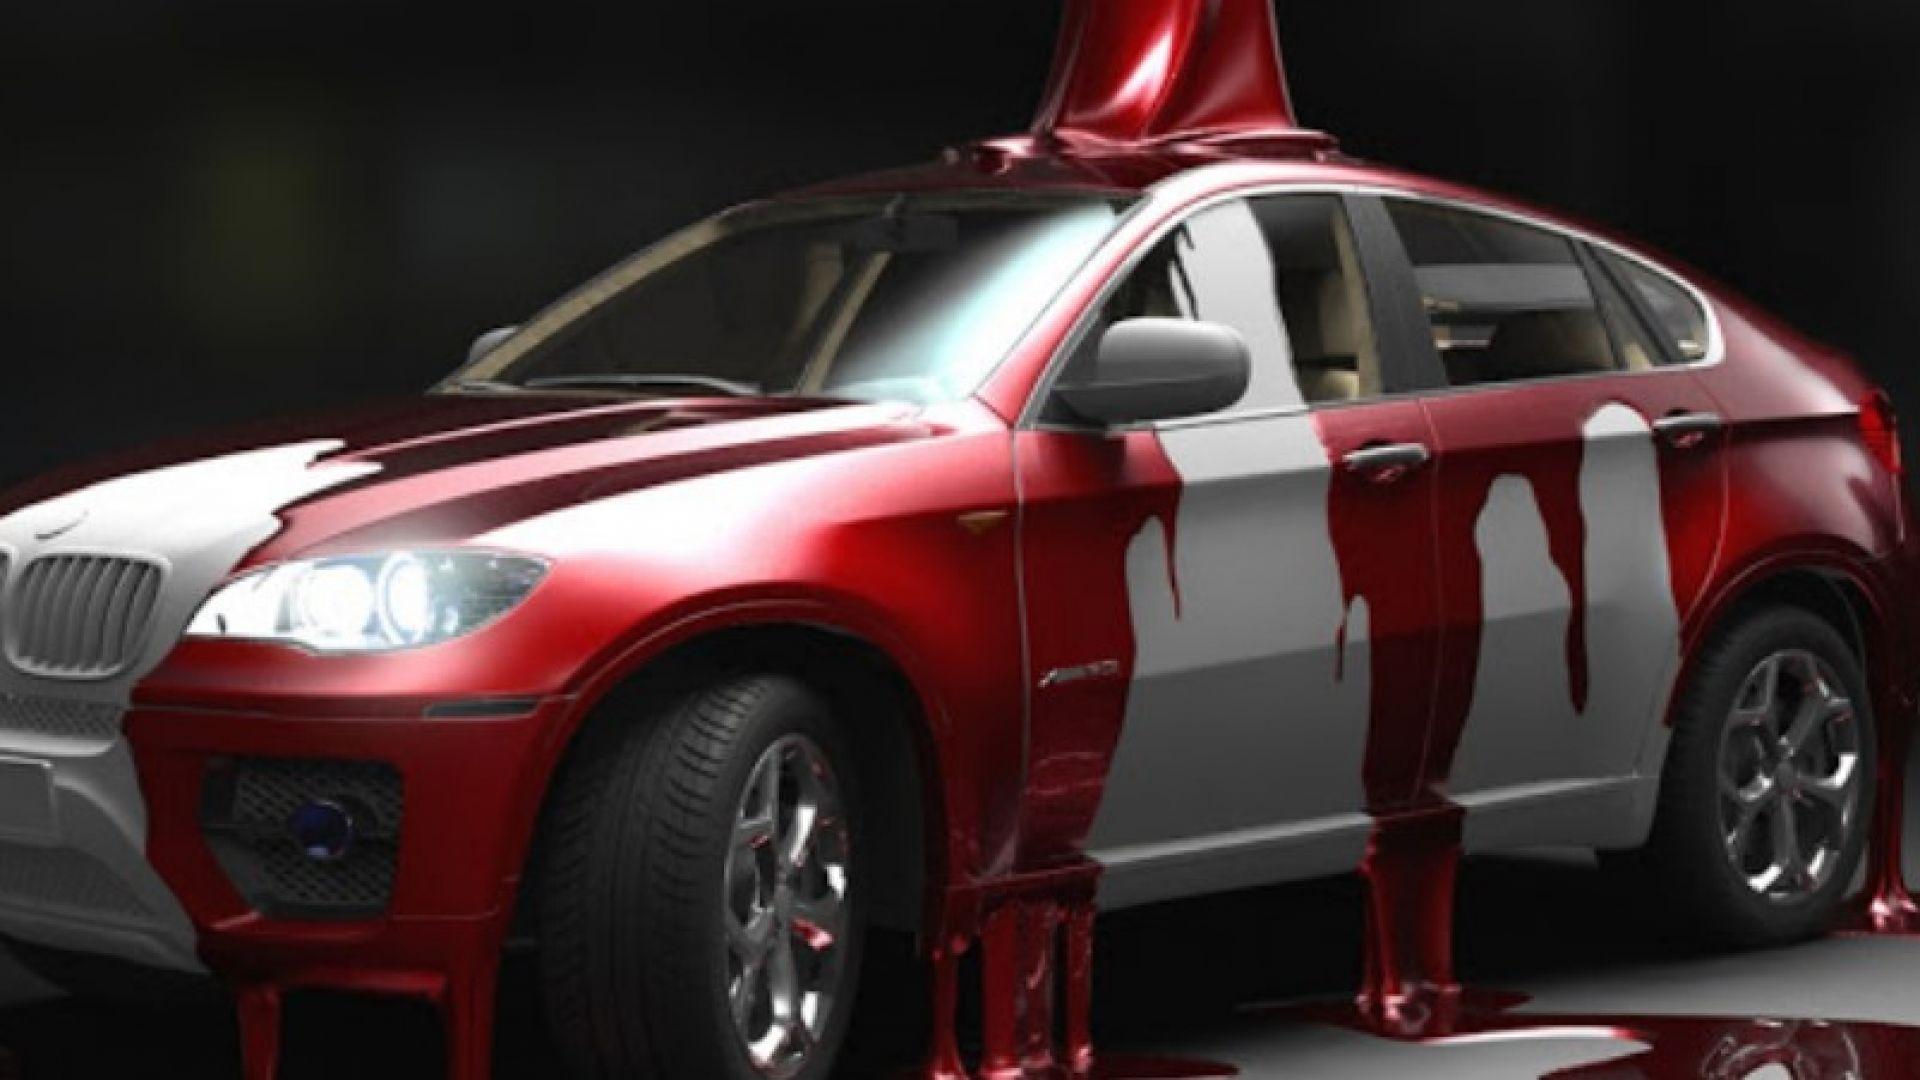 Покраска автомобиля